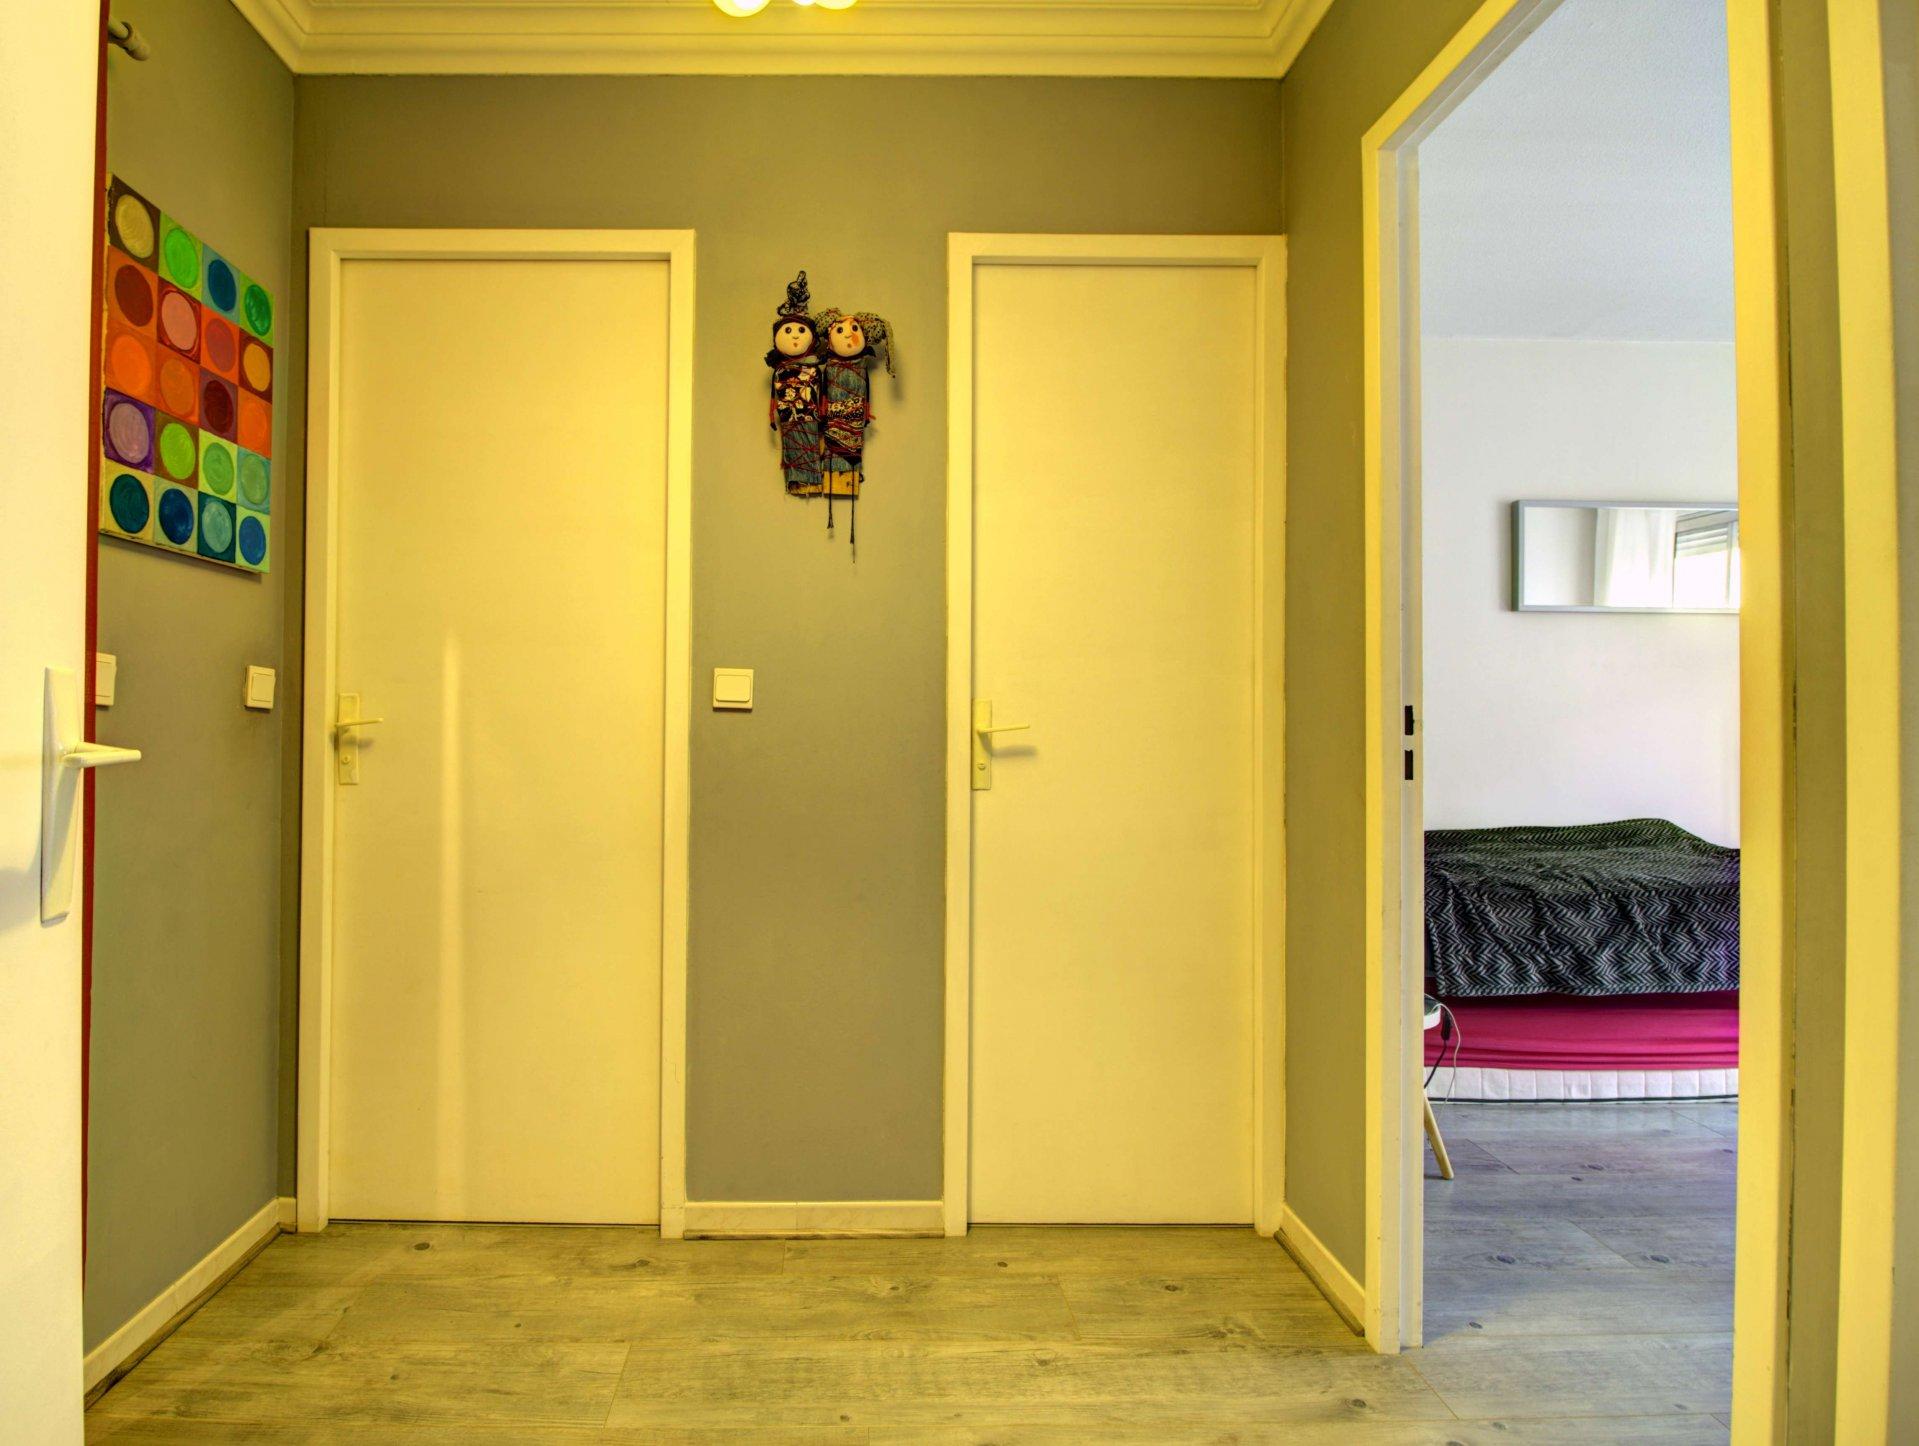 Couloir, parquet